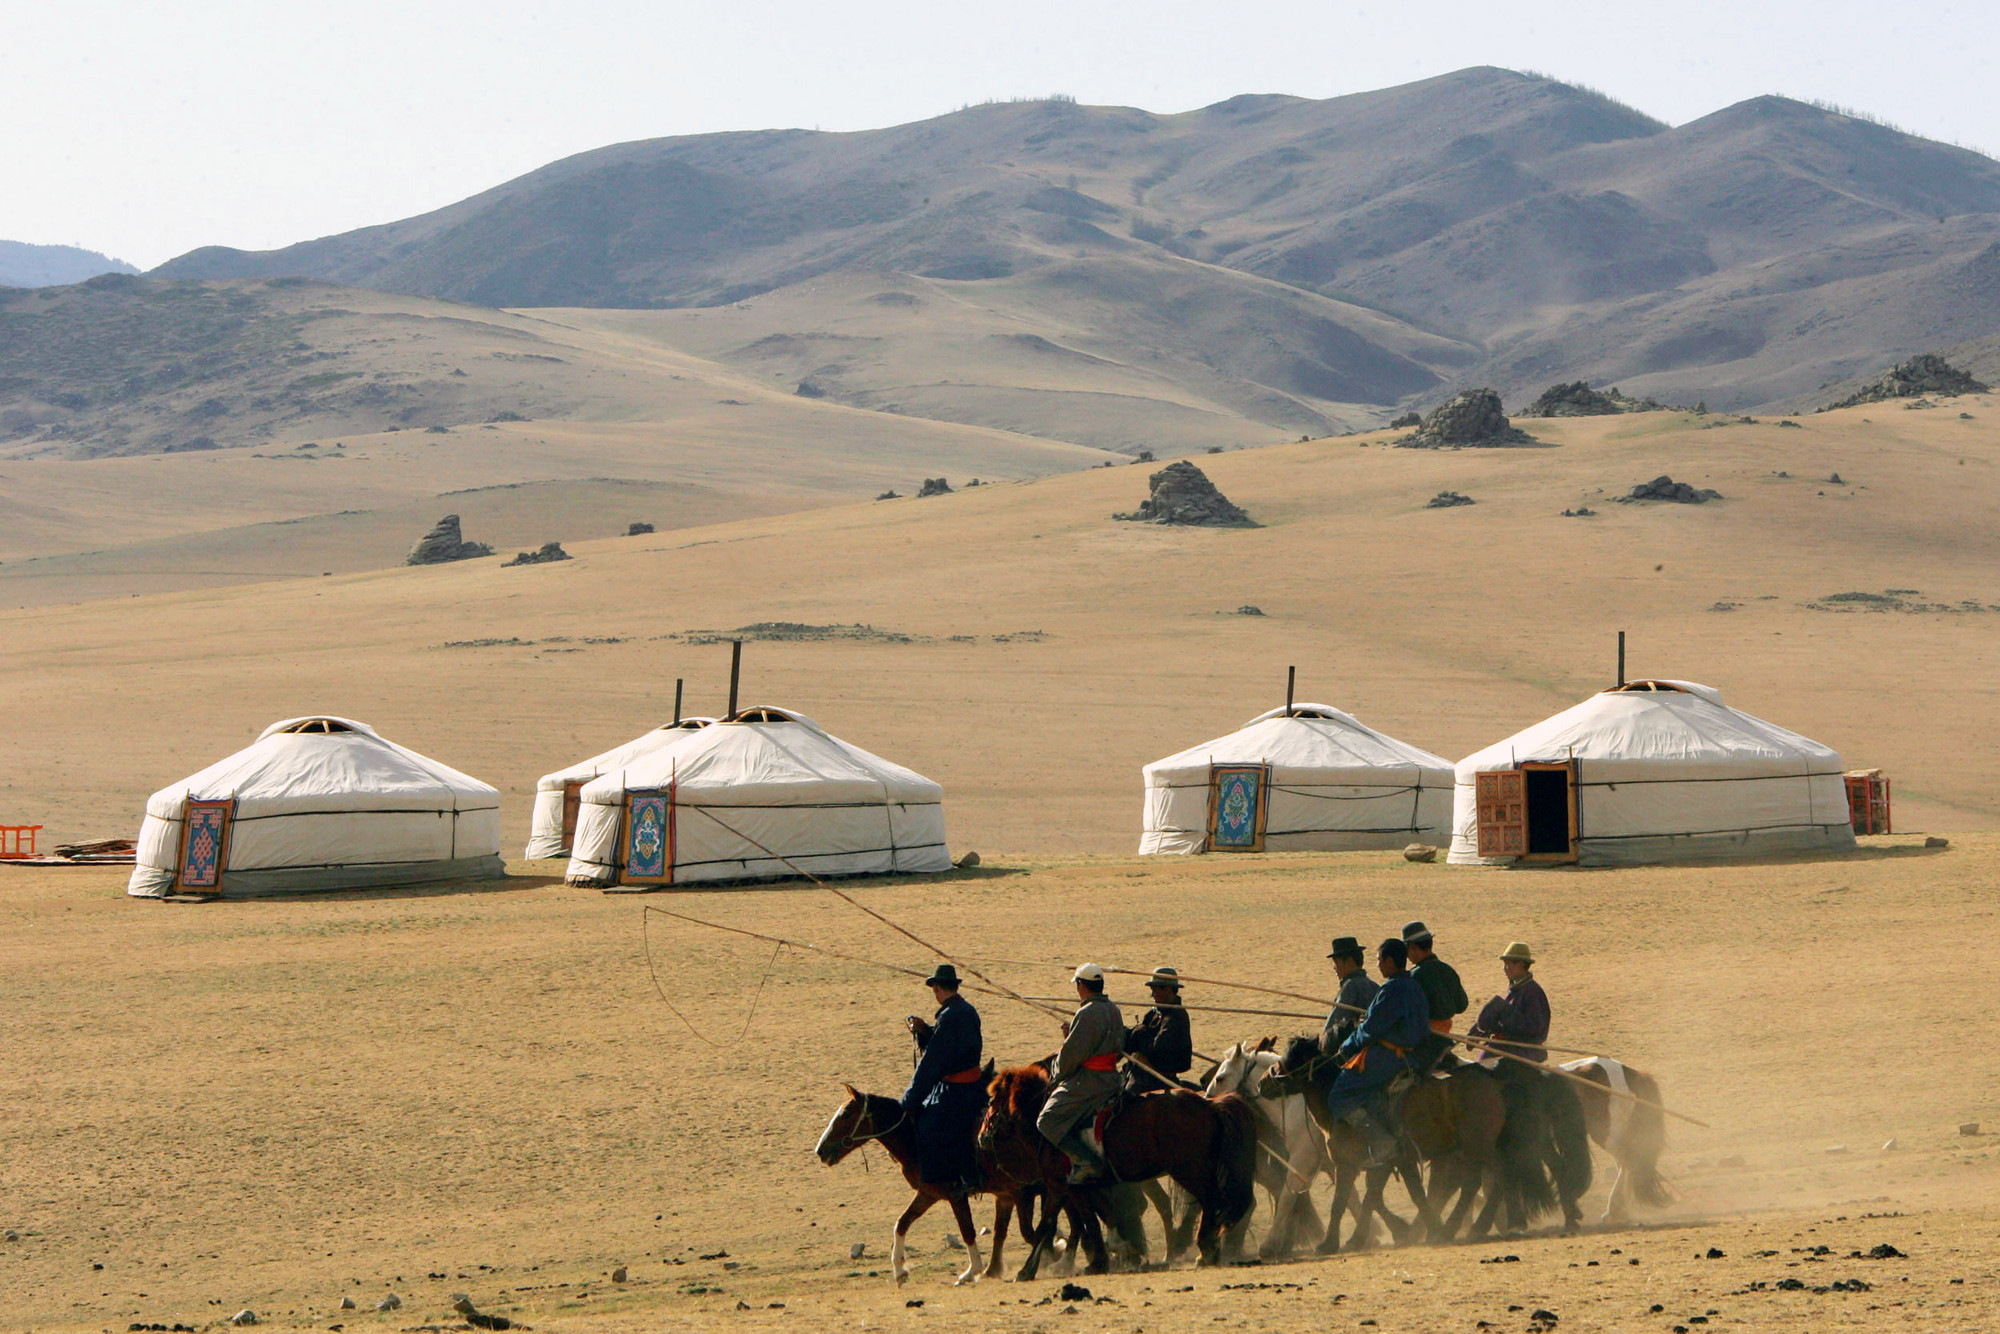 Arquitectura Vernácula: Yurtas, Viviendas Nómades en Mongolia, © Reuters